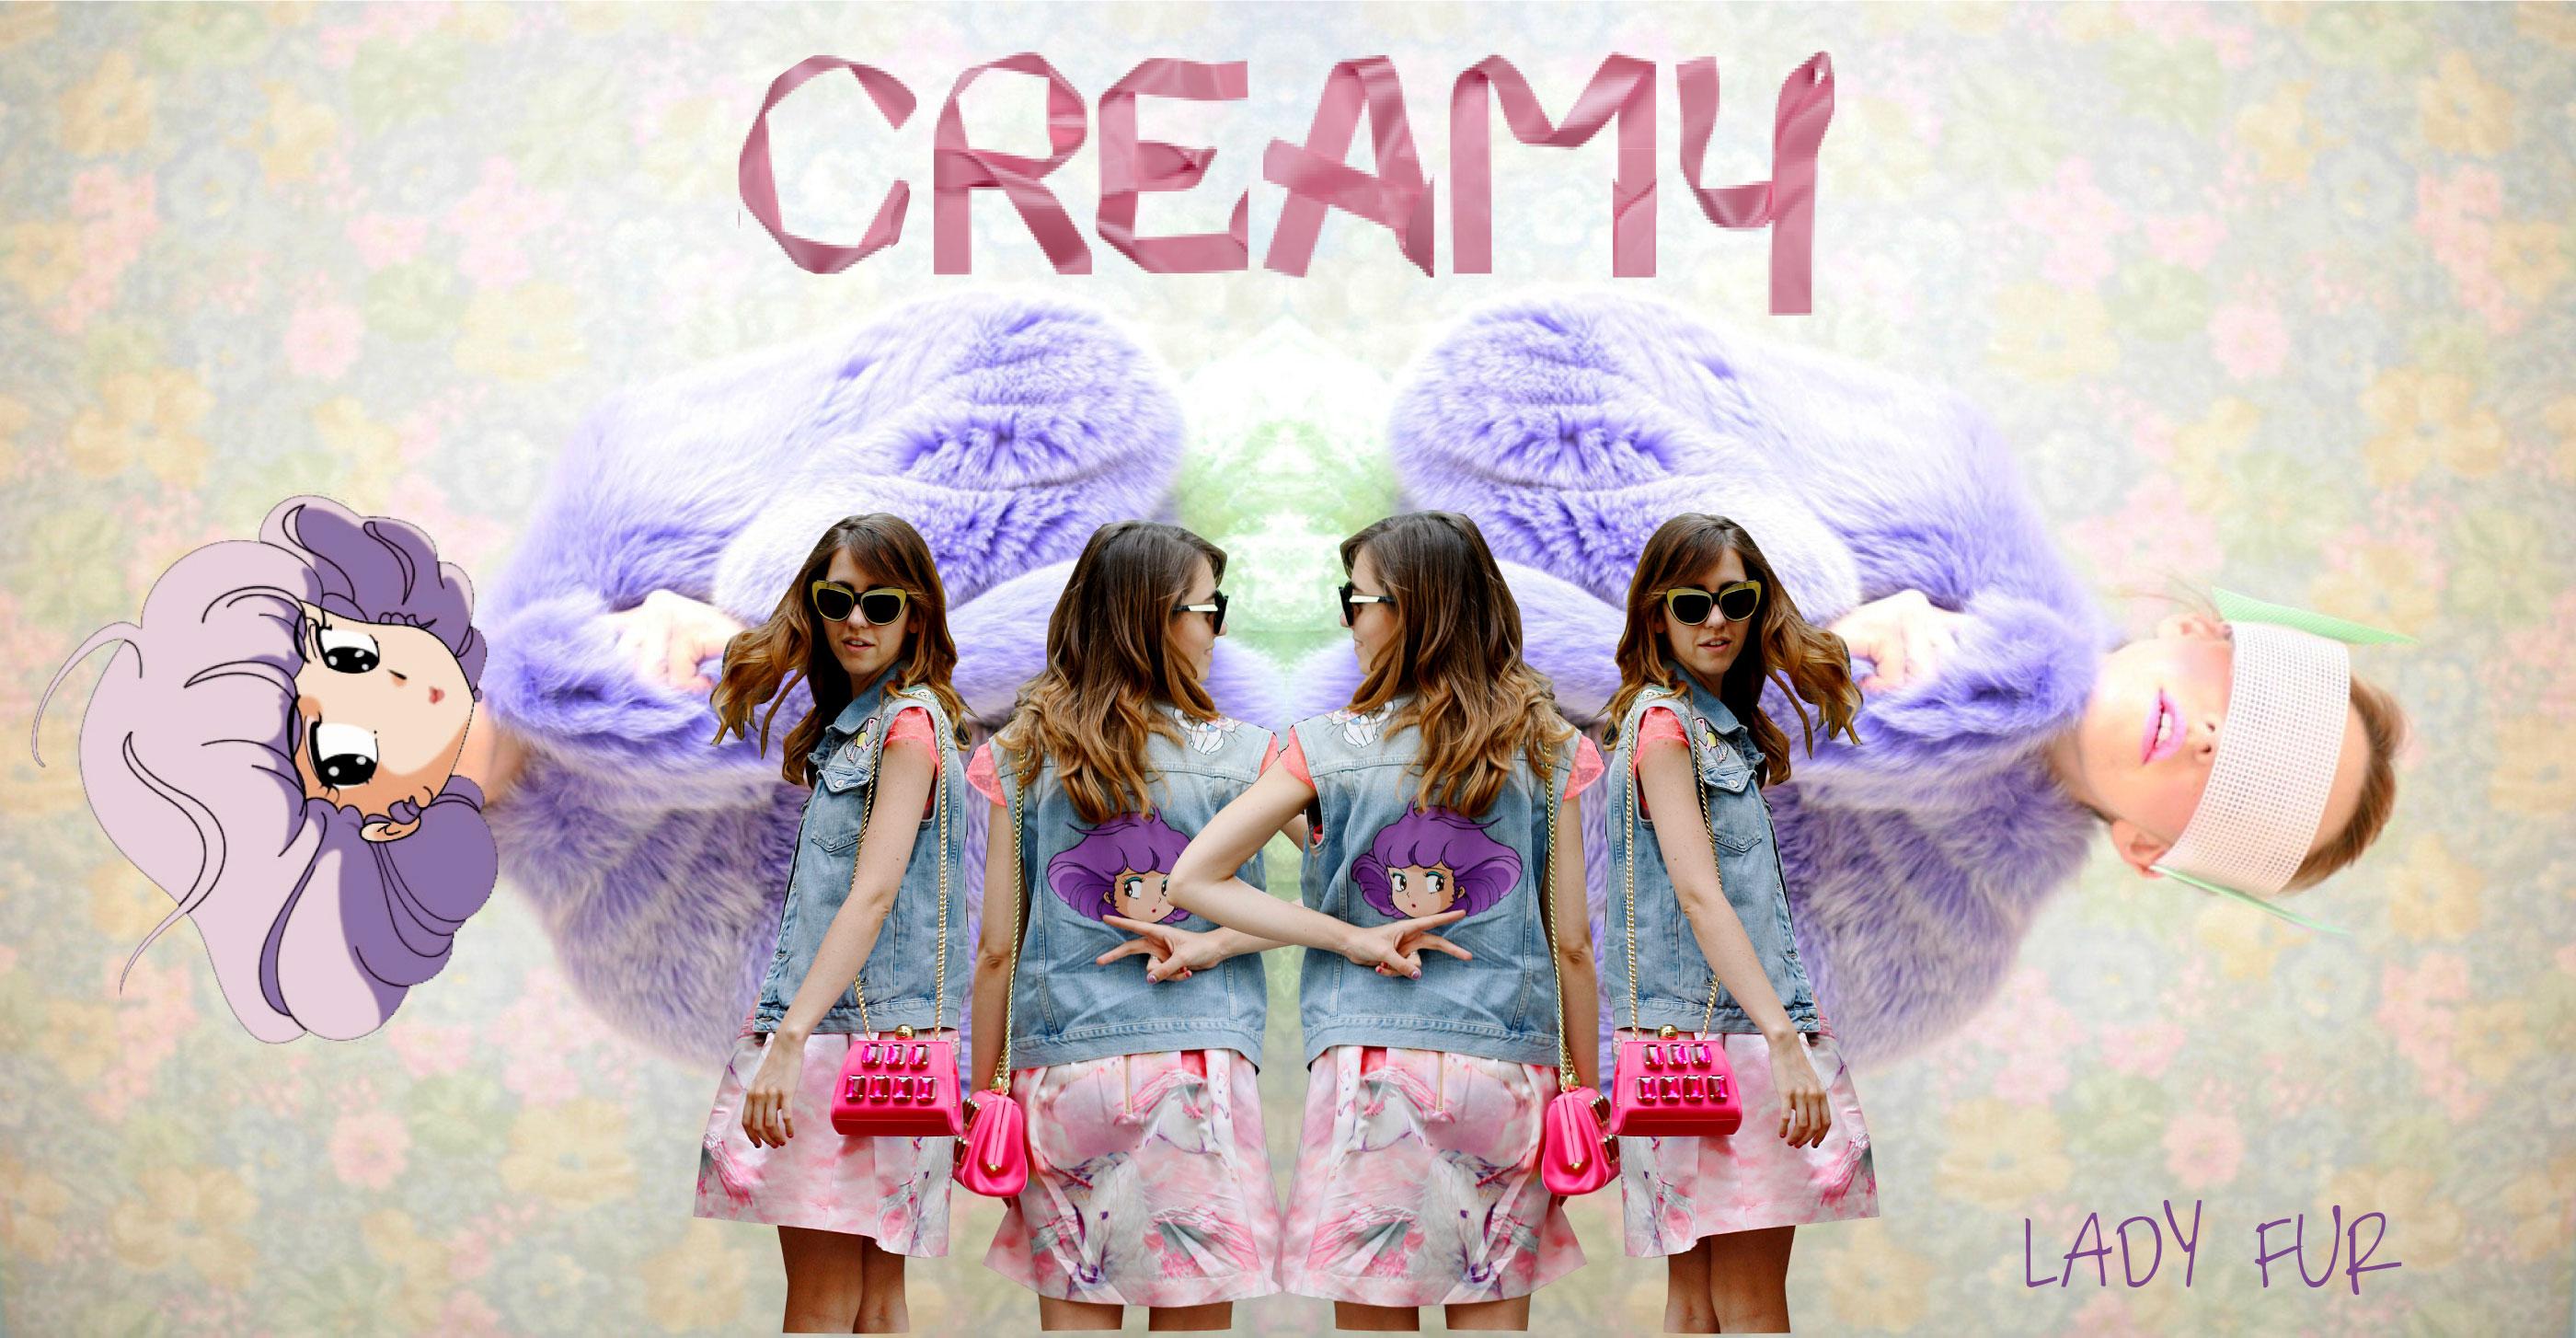 ladyfur_creamymamigirl